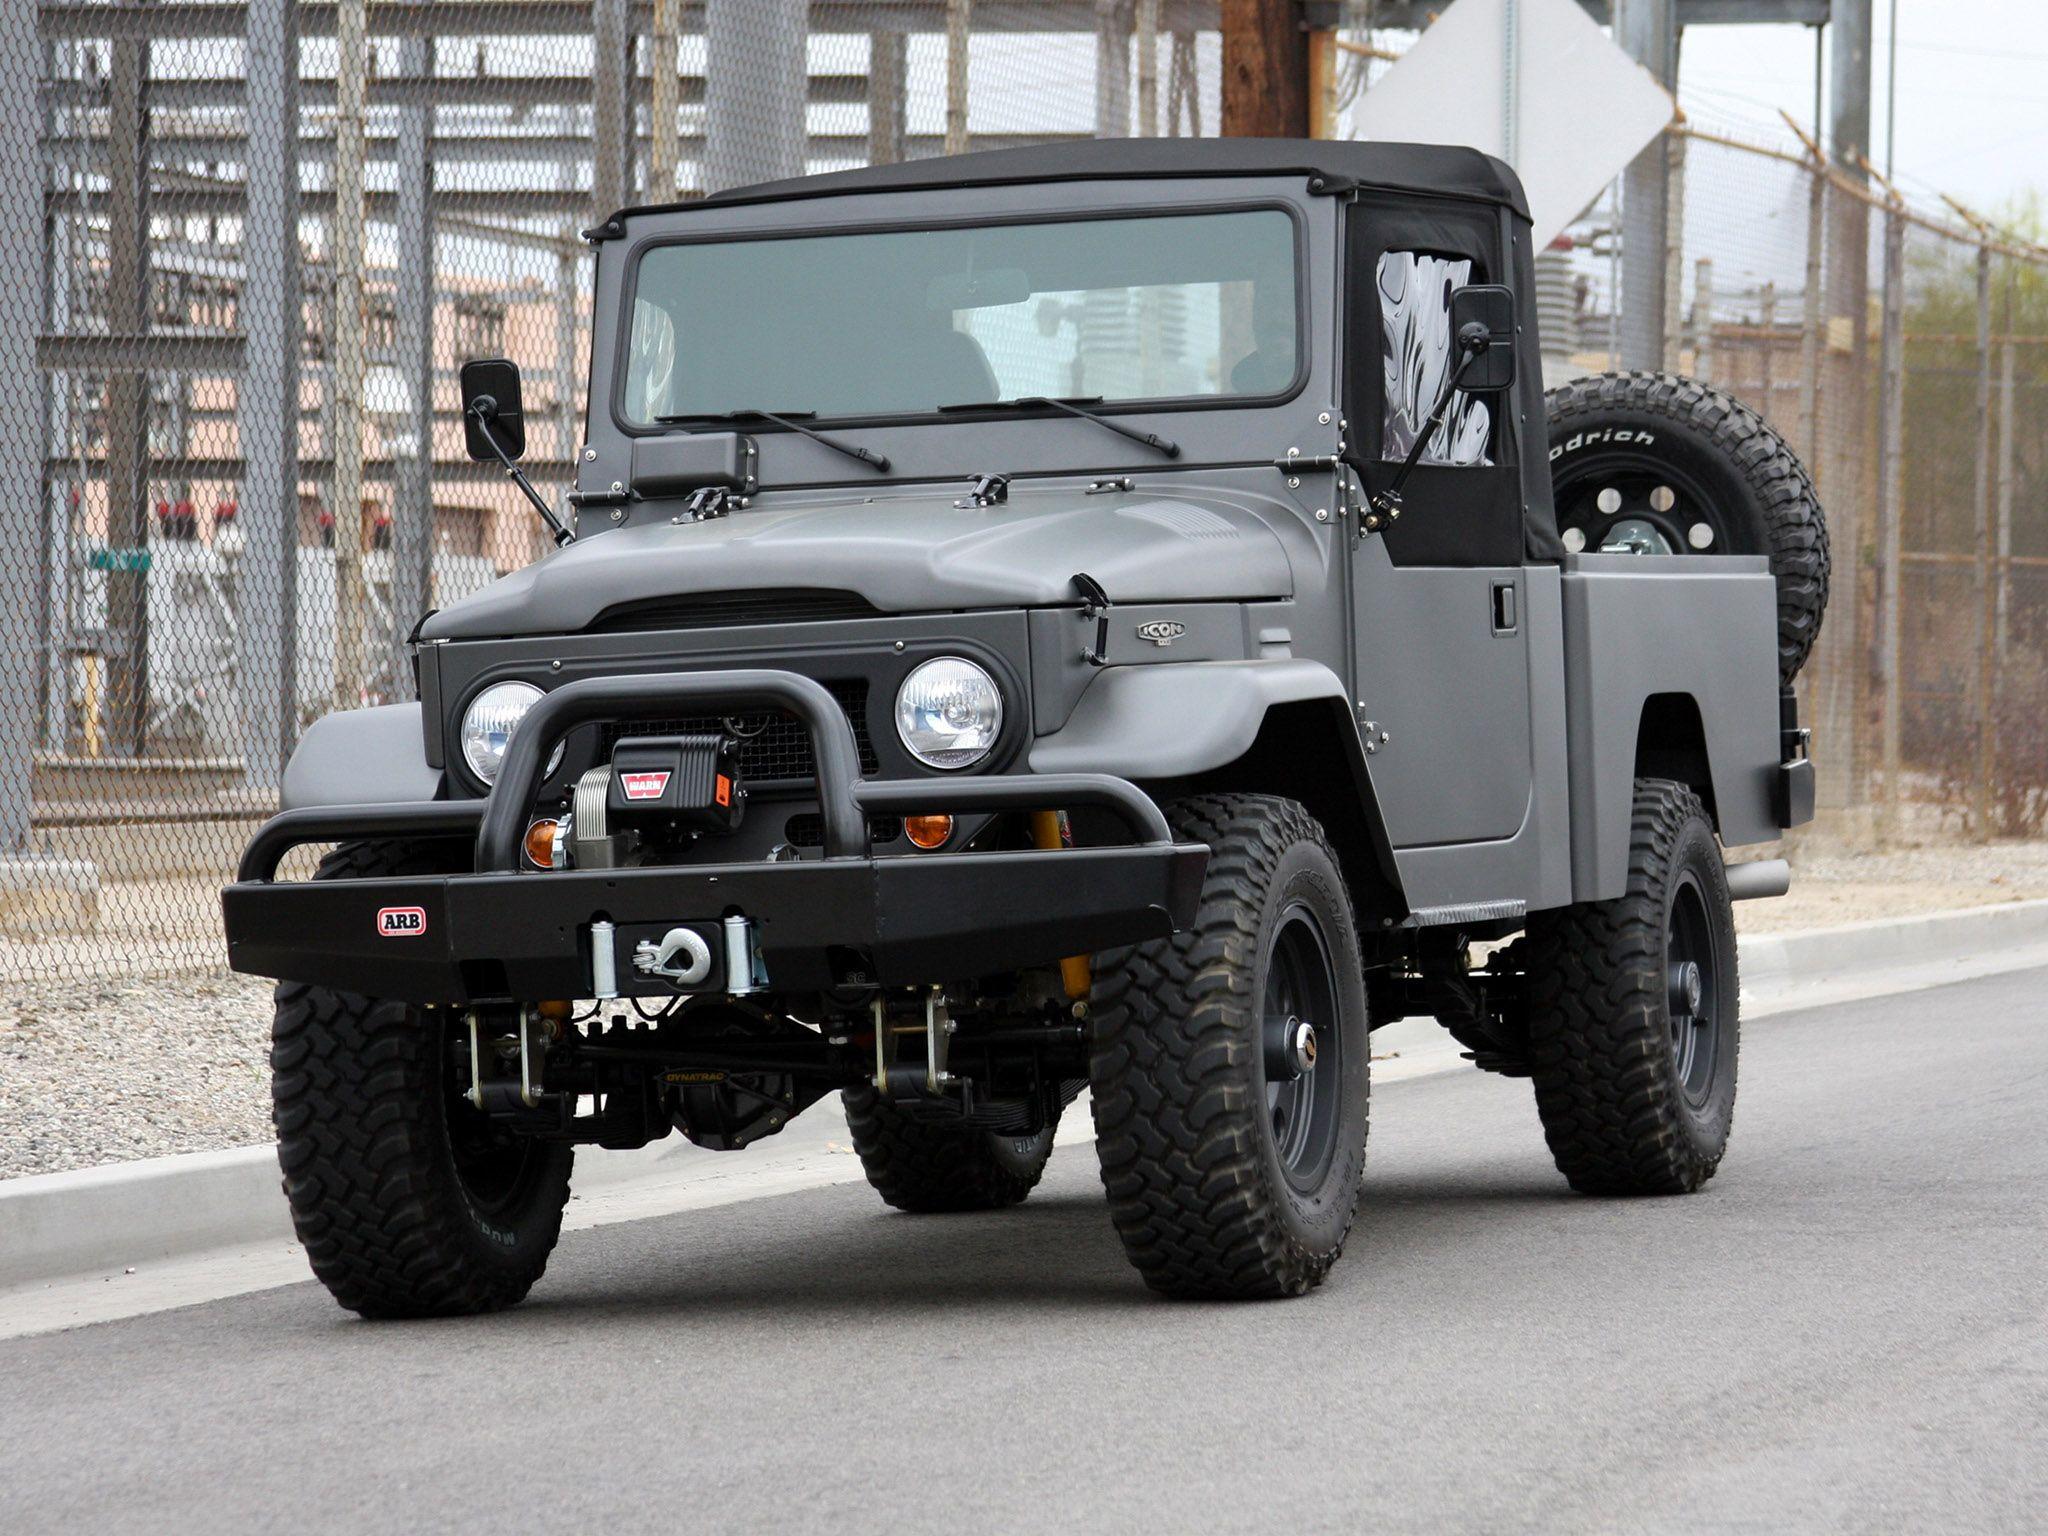 toyota fj pickup land cruiser pickup fj45 based on. Black Bedroom Furniture Sets. Home Design Ideas